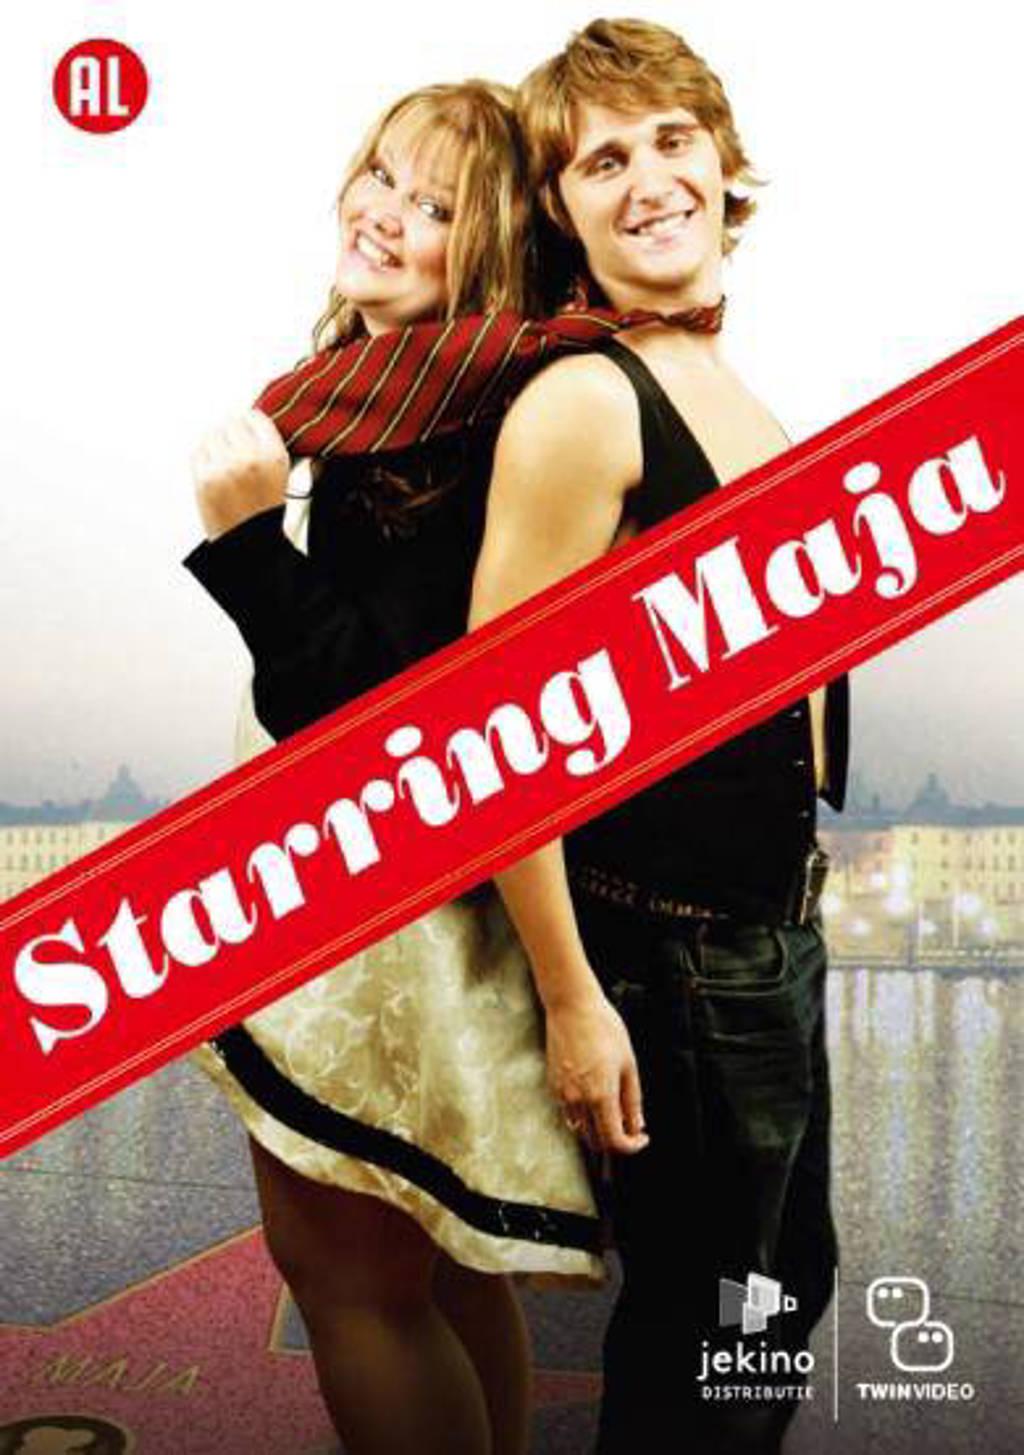 Starring Maja (DVD)